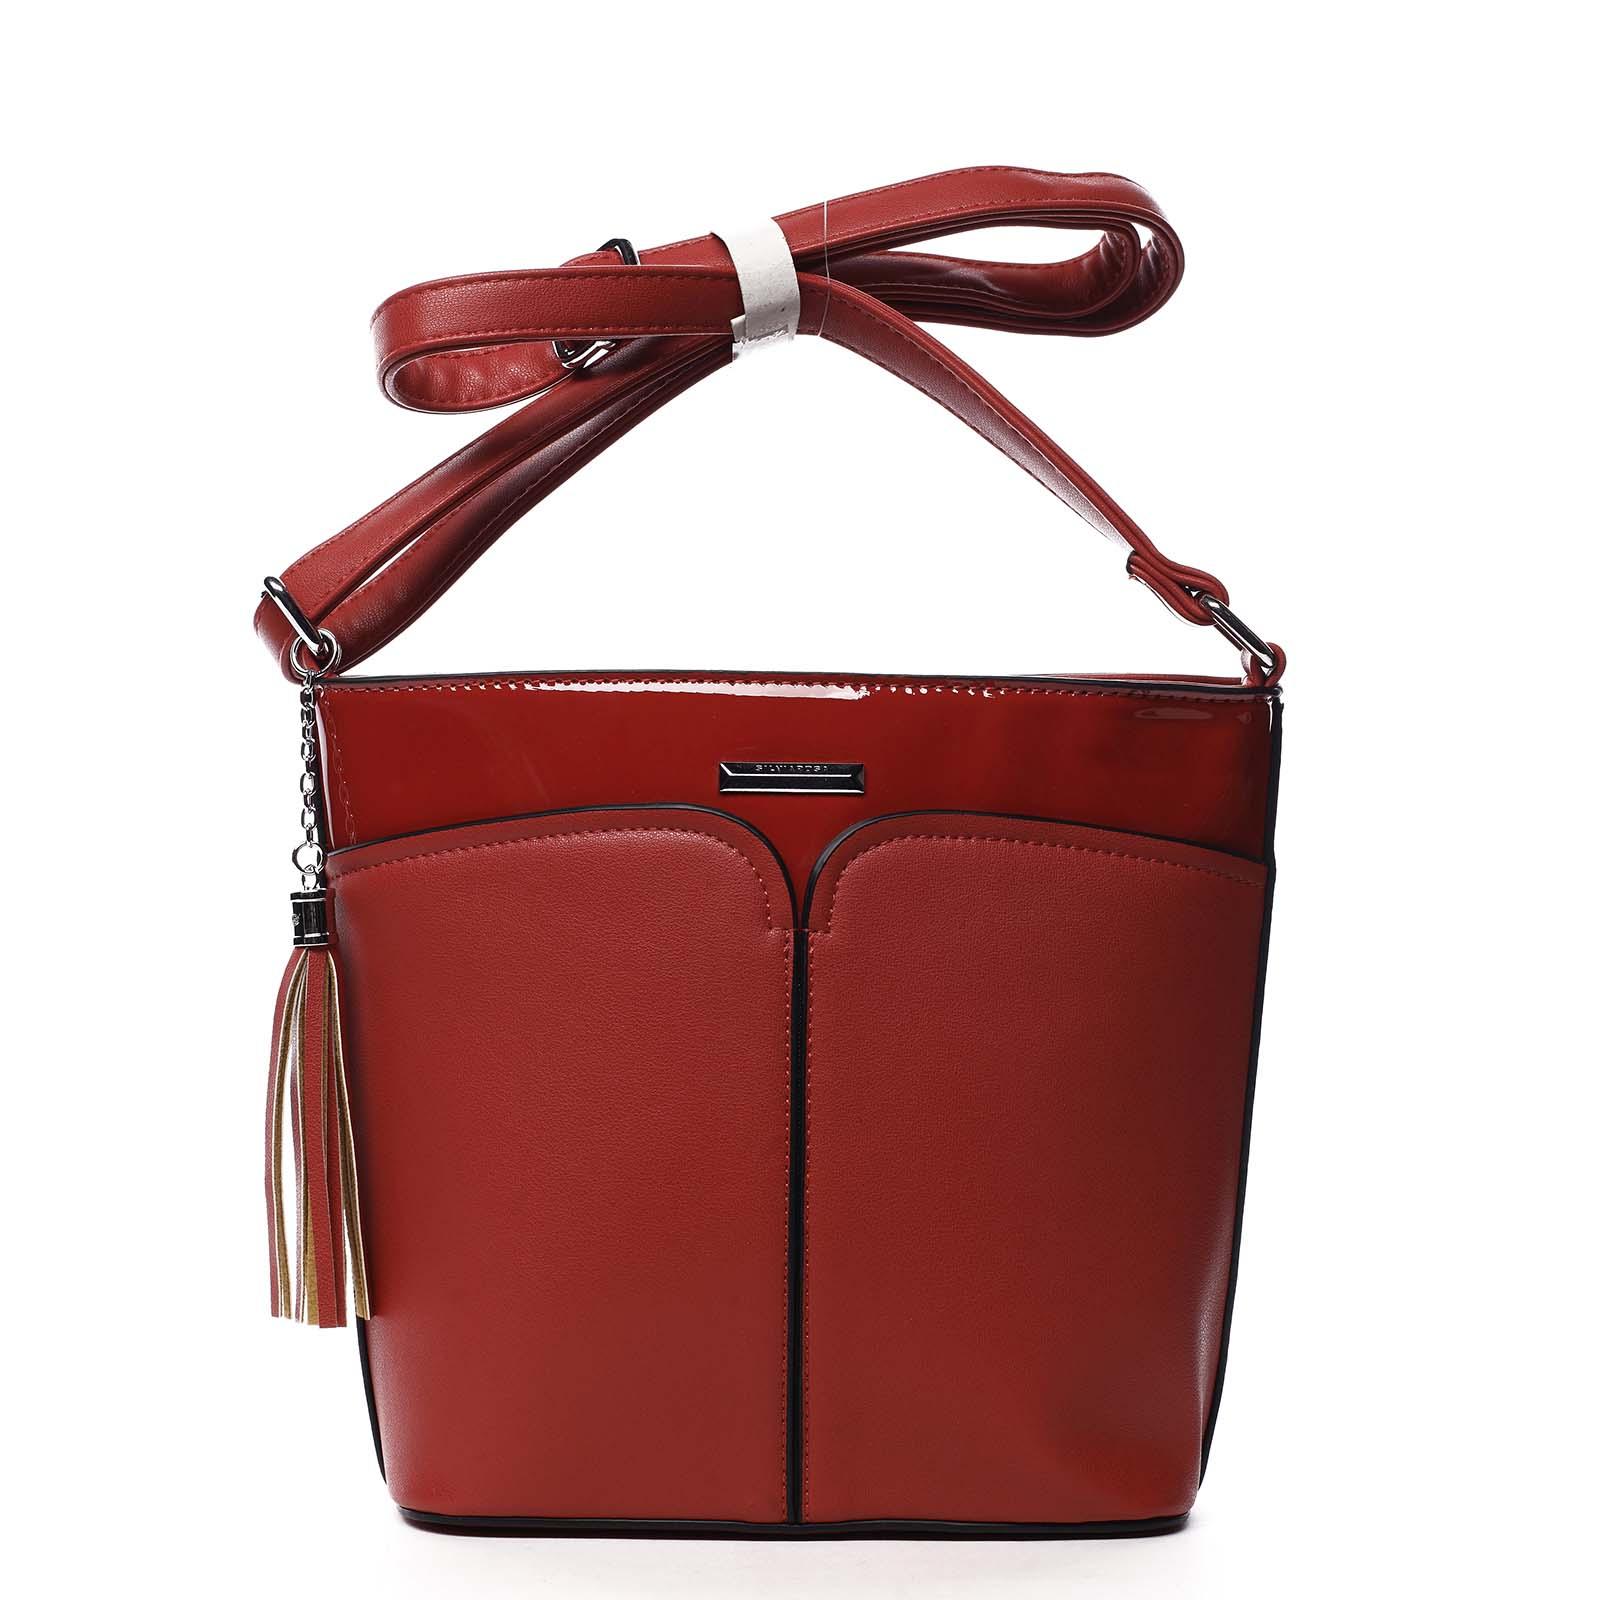 Dámská crossbody kabelka červená - Silvia Rosa Enegmi